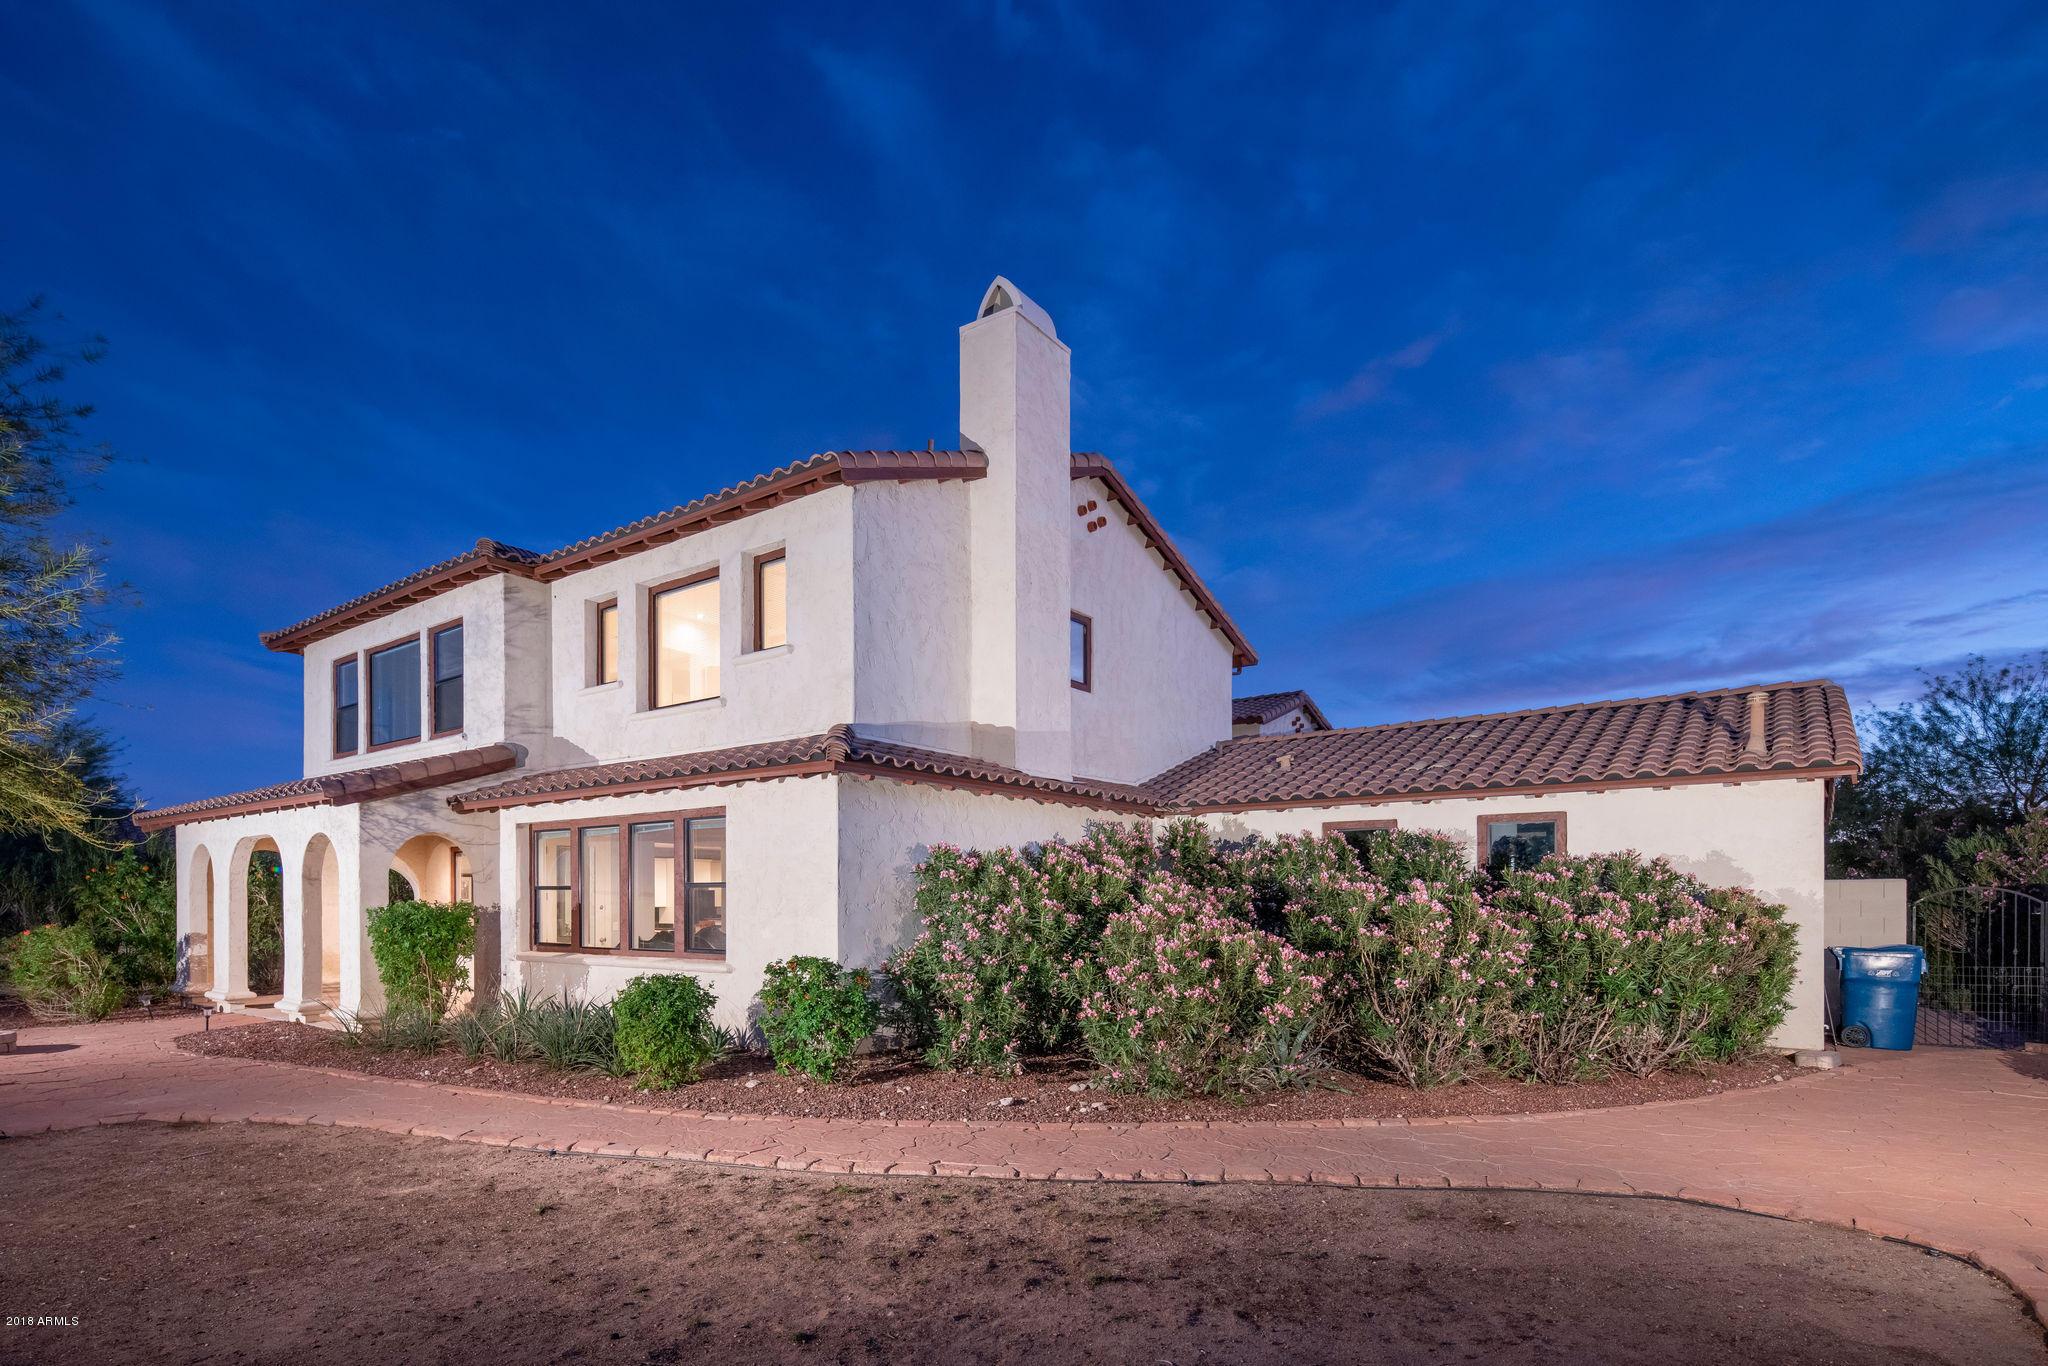 MLS 5851952 20574 W Canyon Drive, Buckeye, AZ 85396 Buckeye AZ Four Bedroom